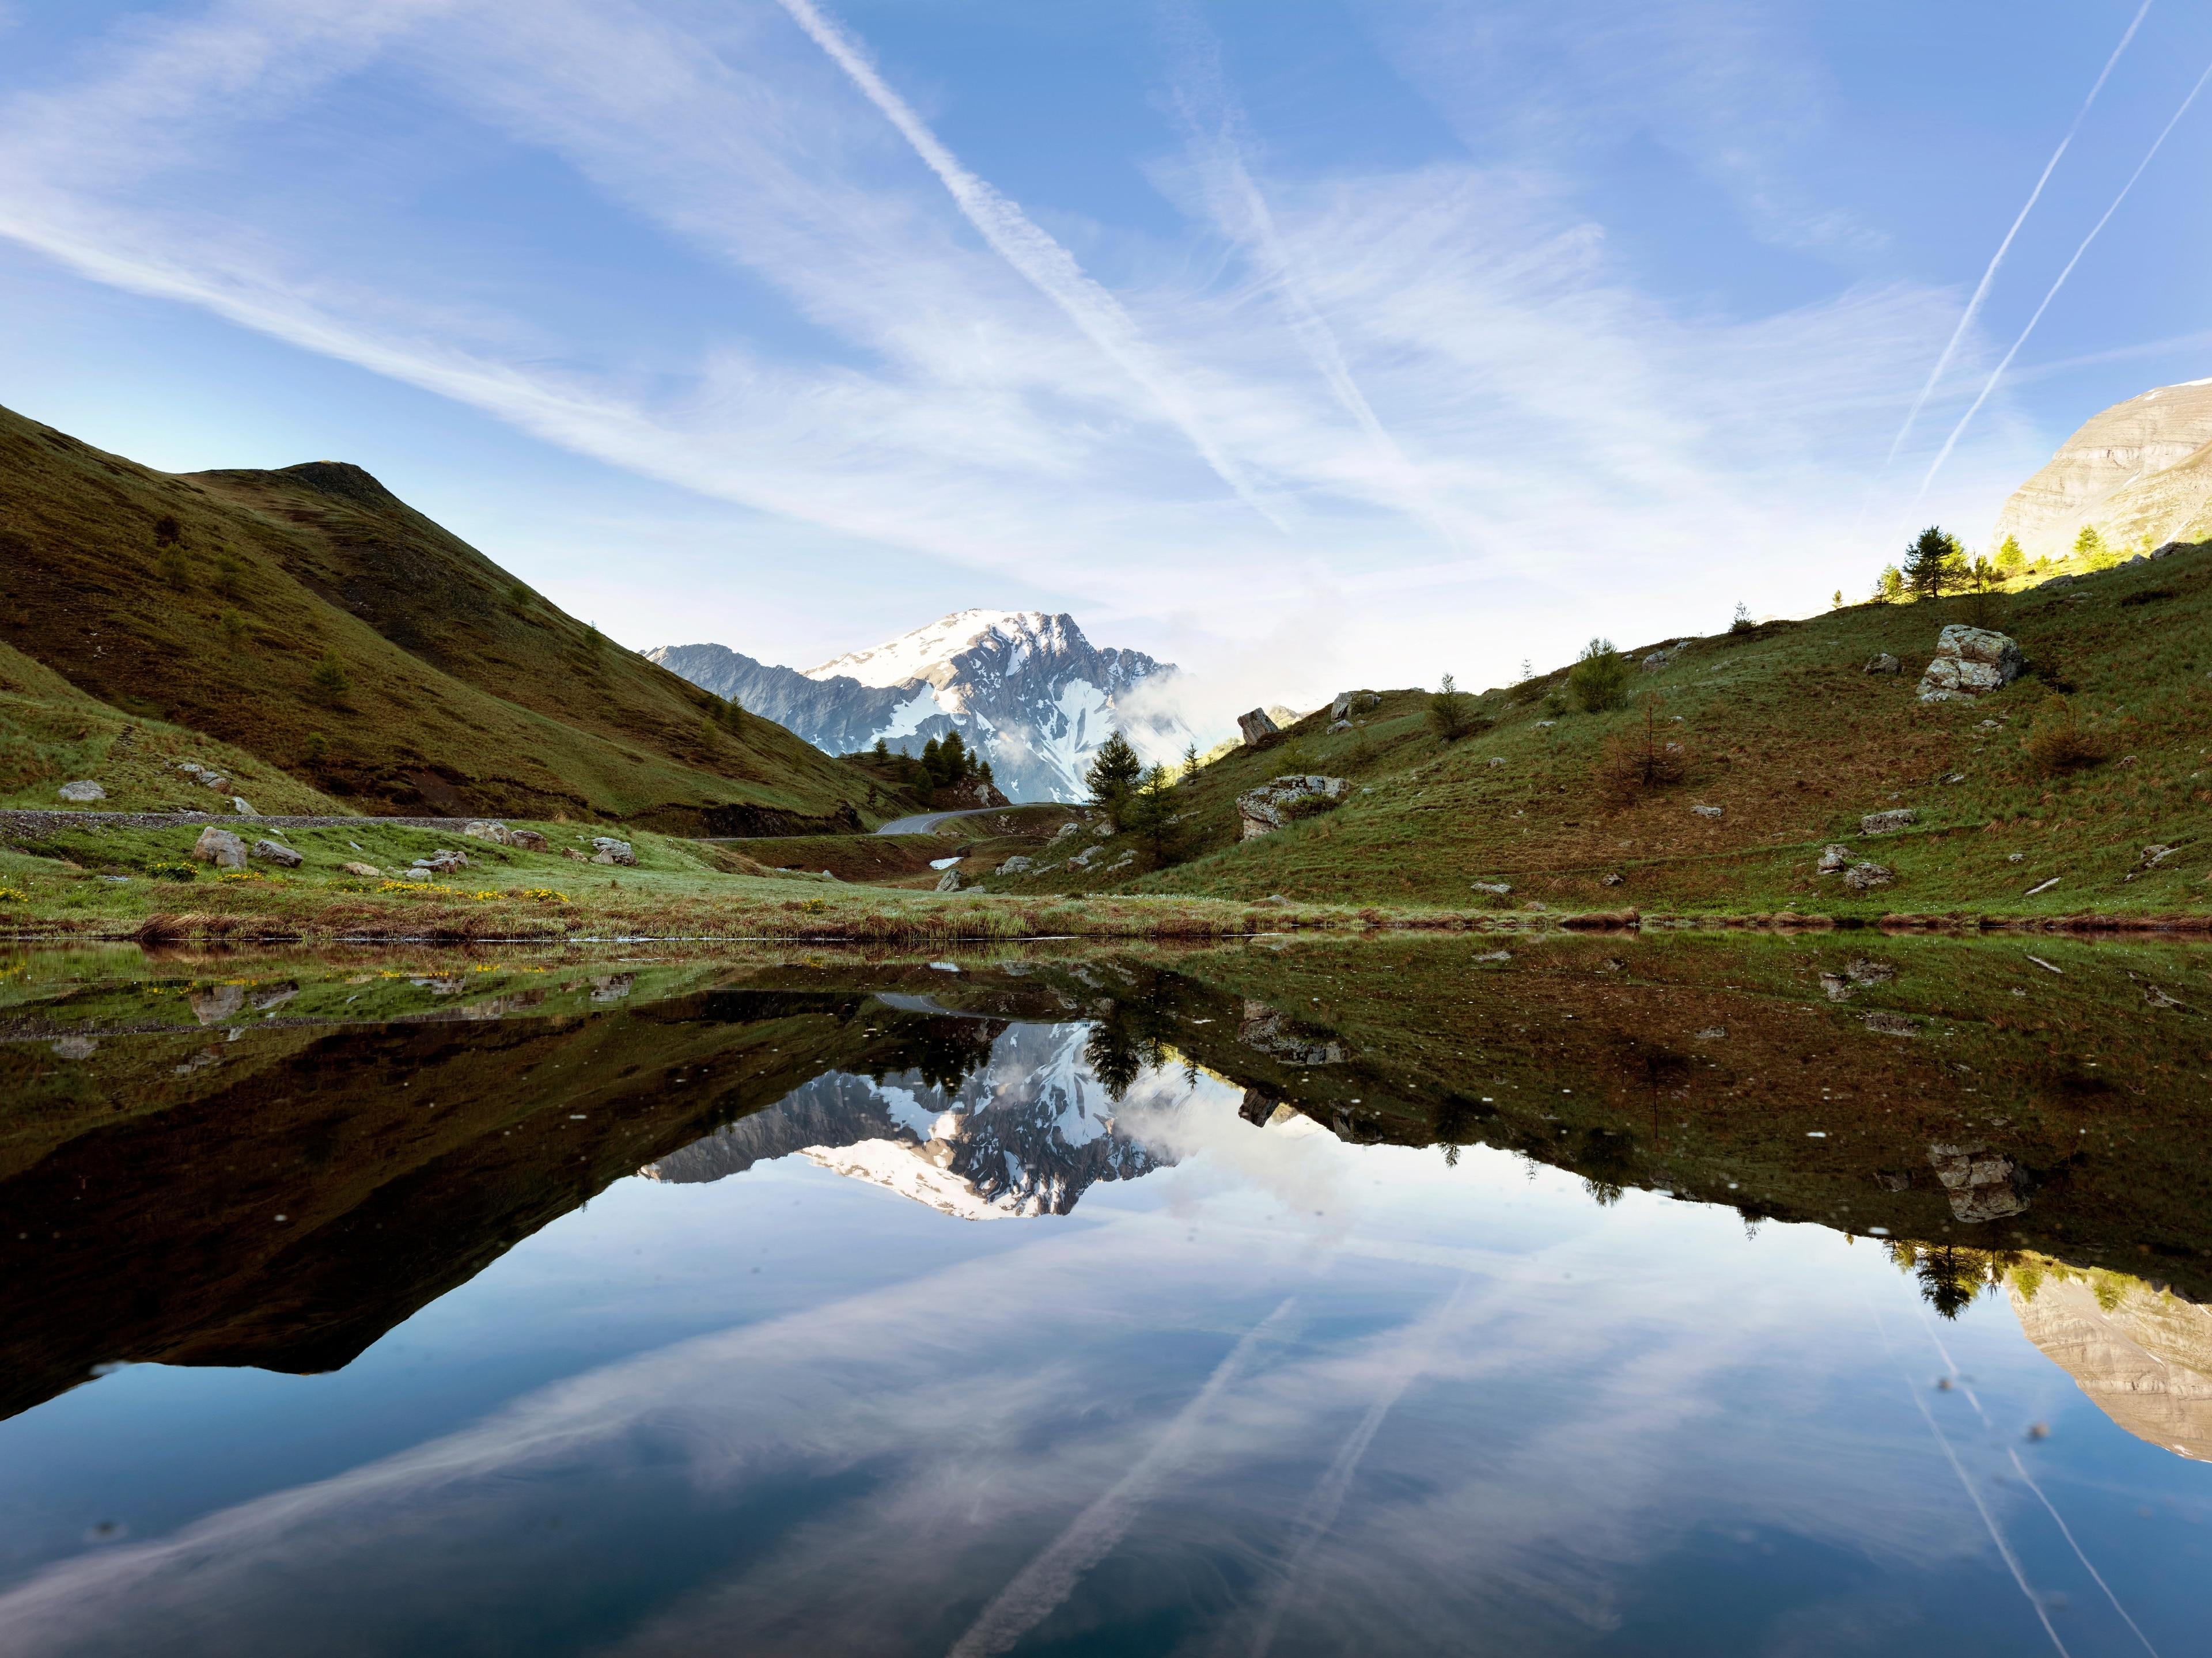 Vars, Hautes-Alpes, Frankreich